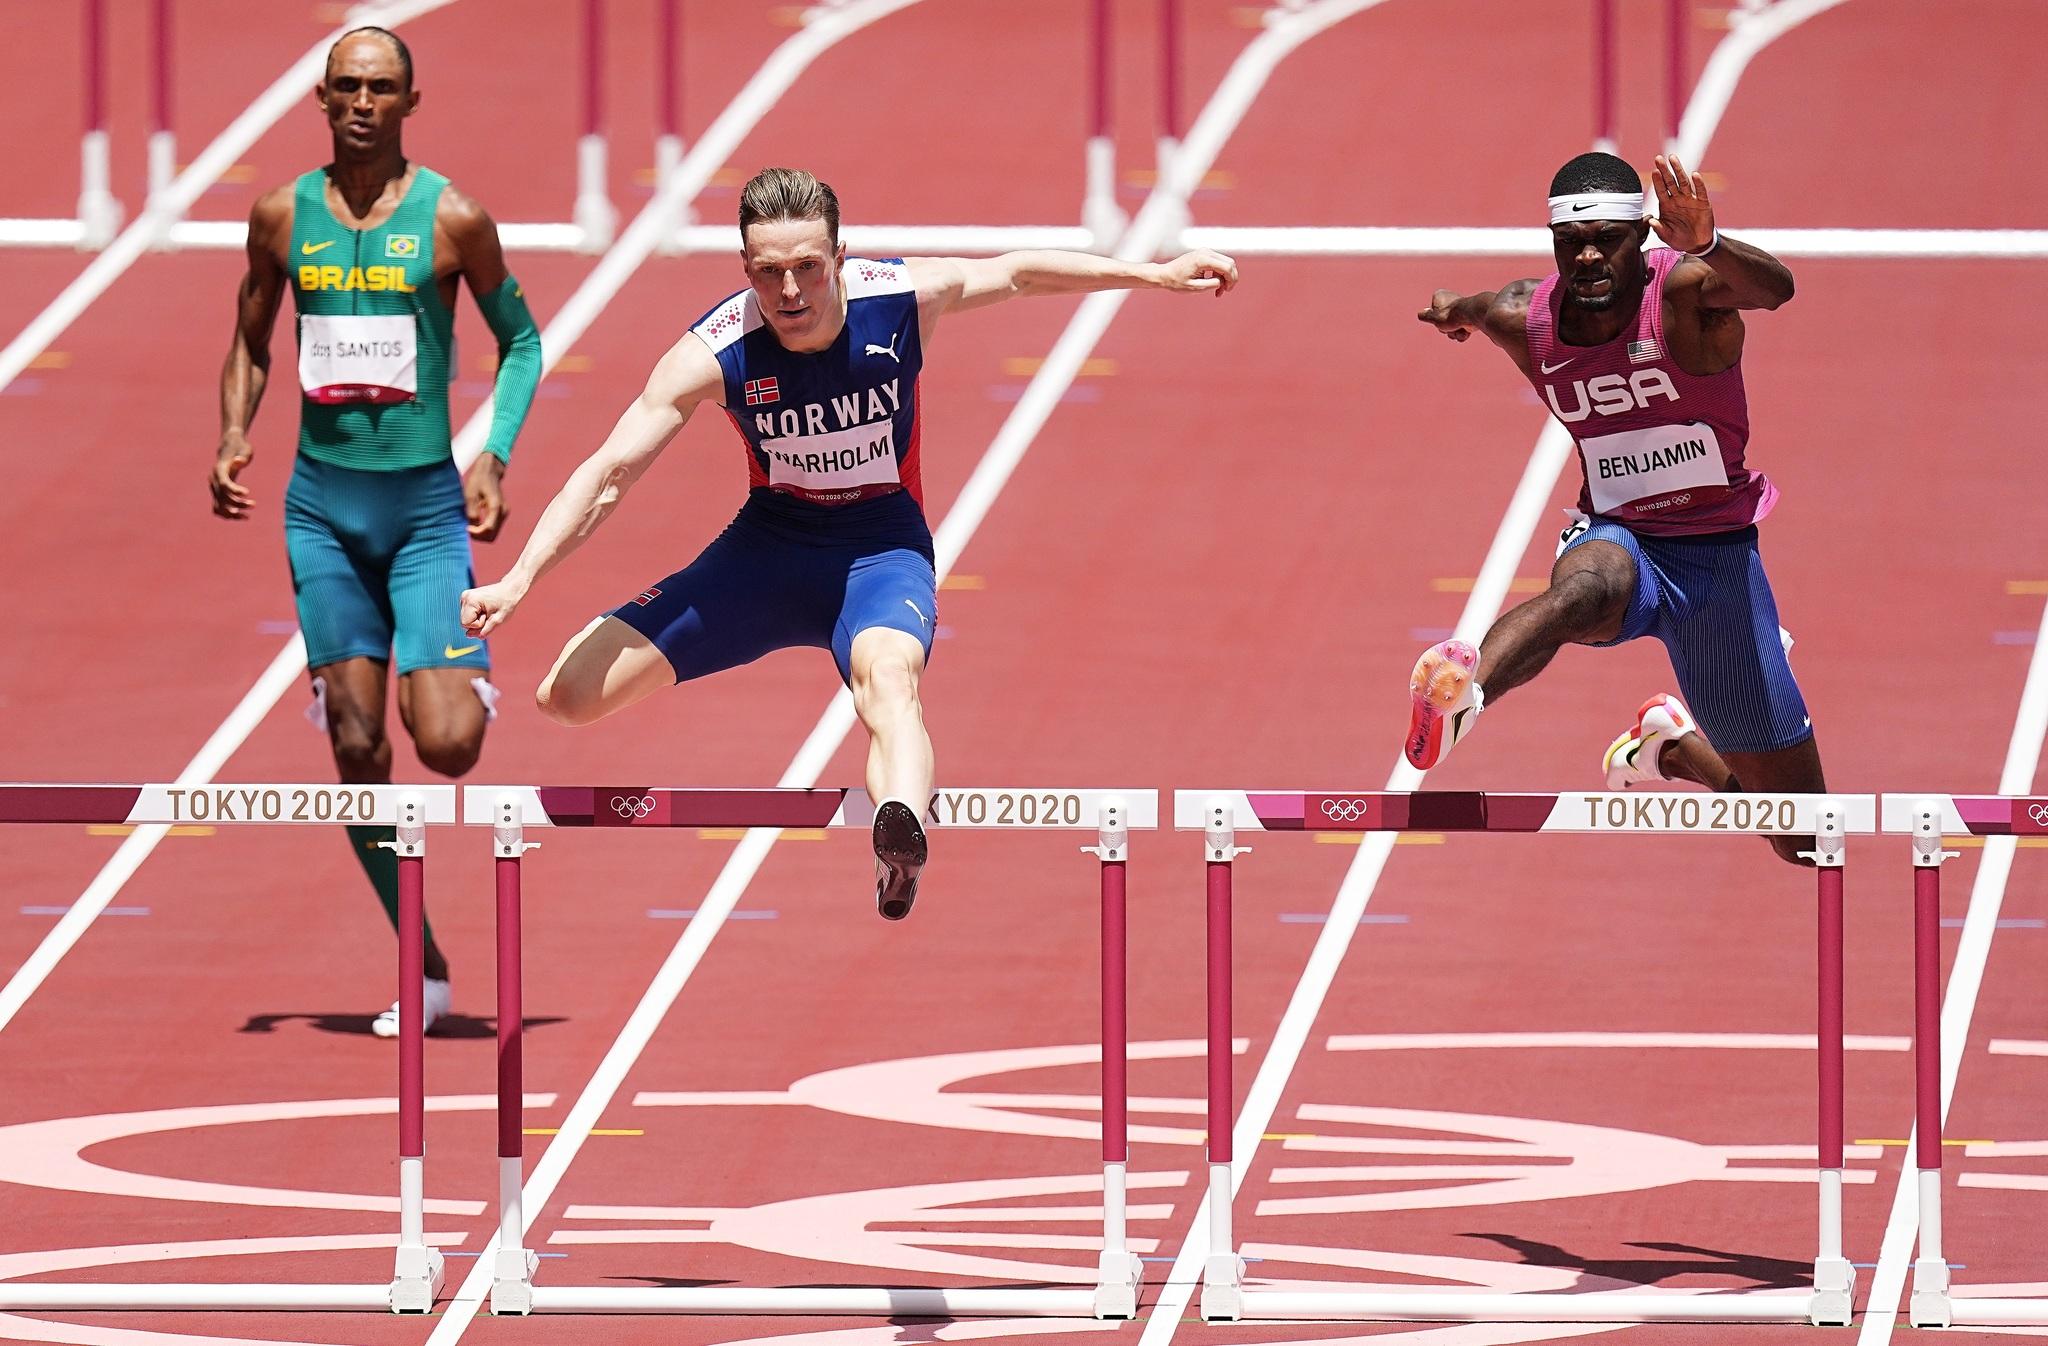 Norway's Karsten Warholm and the USA's Rai Benjamin during the men's 400m hurdles final.